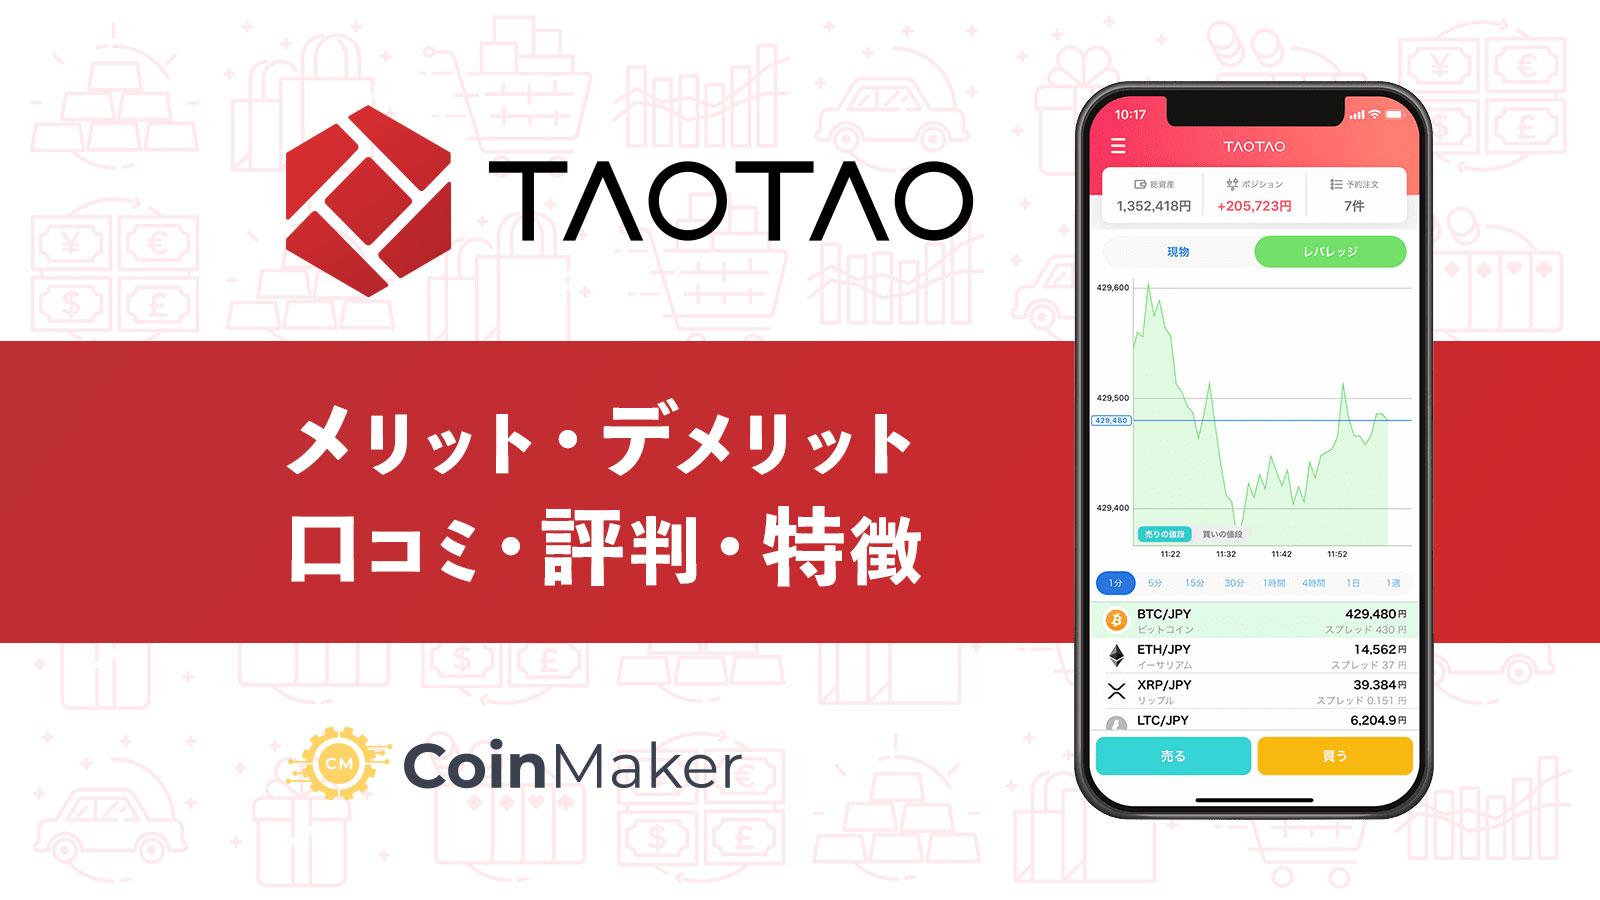 TAOTAO(タオタオ)特徴・評判をわかりやすく解説